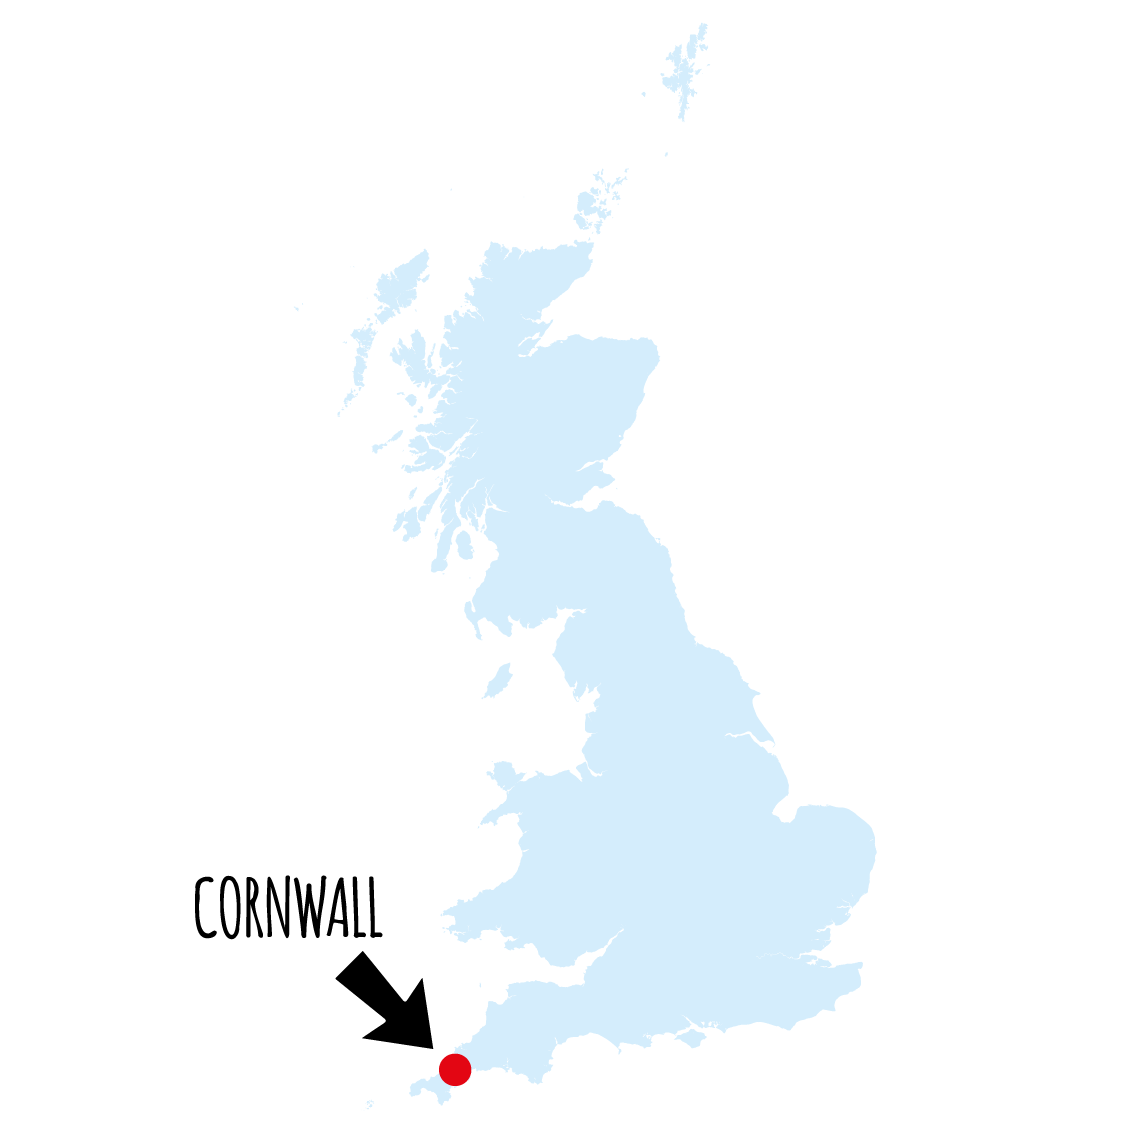 cornwall-map.png